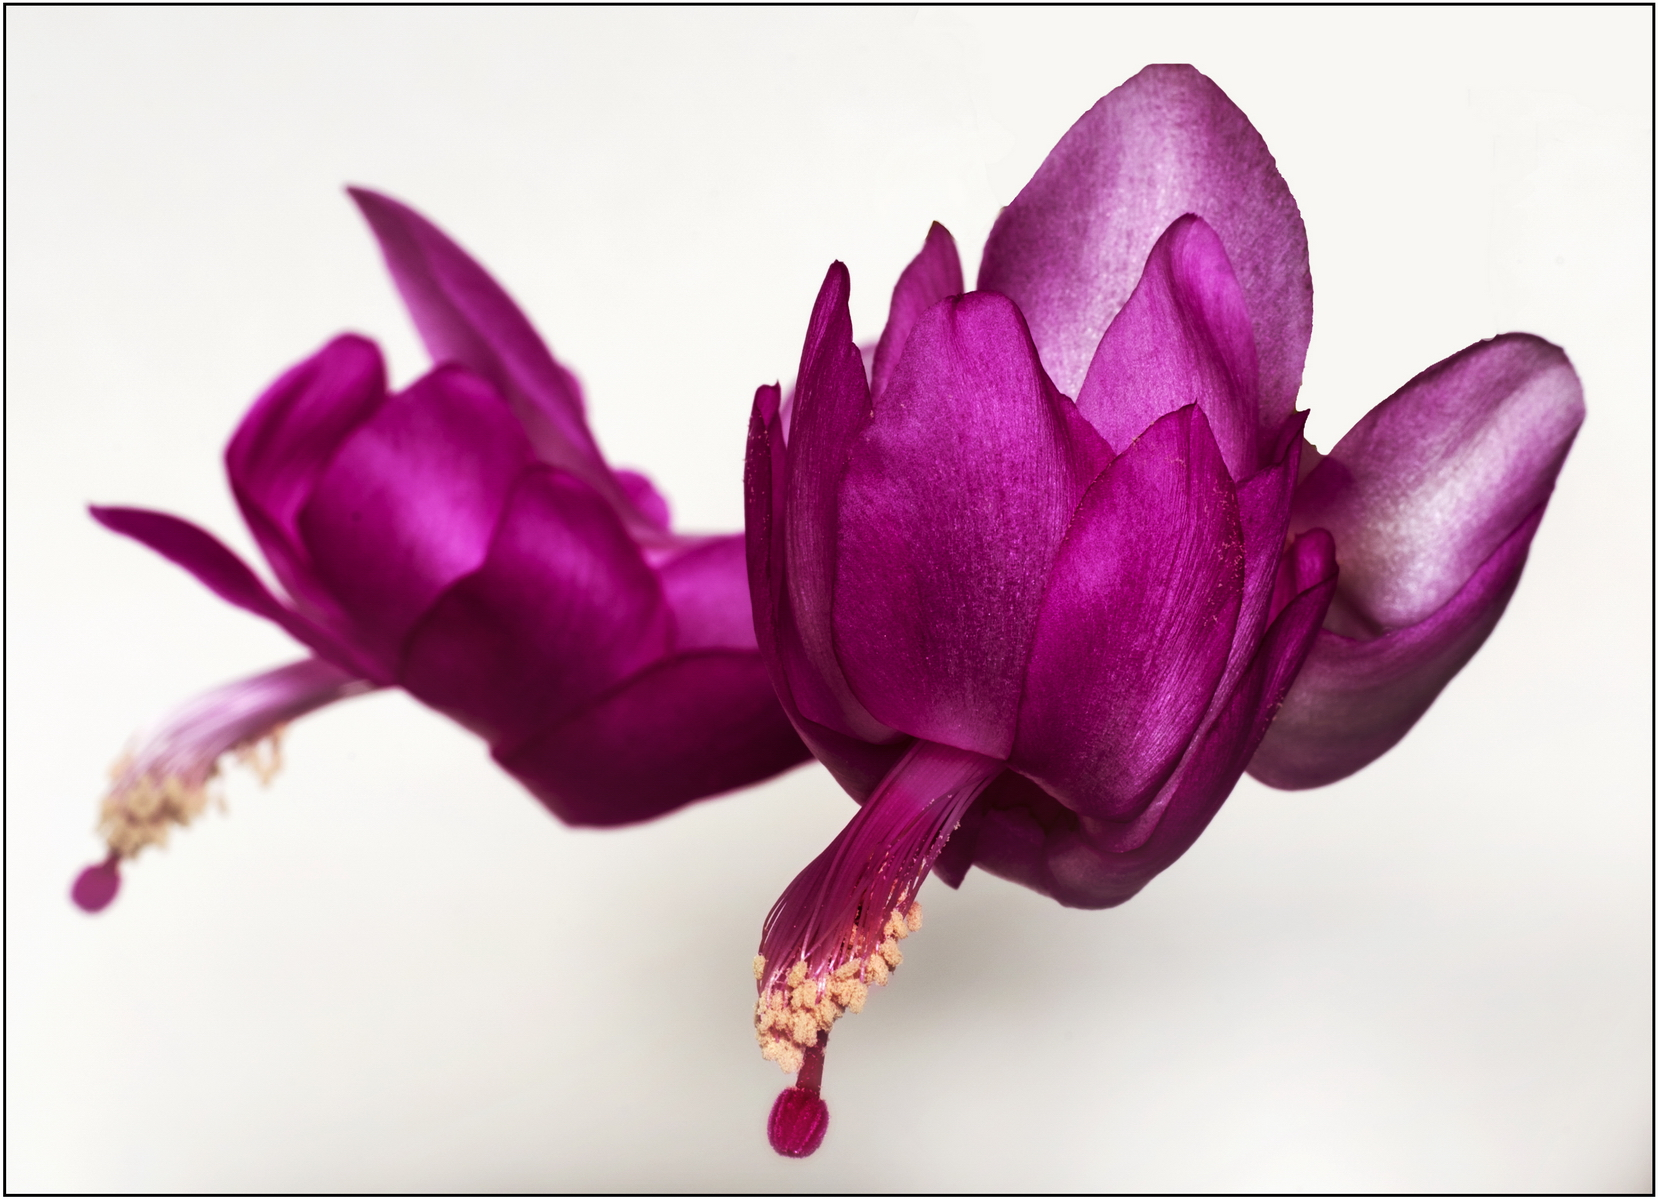 Zygo cactus flower